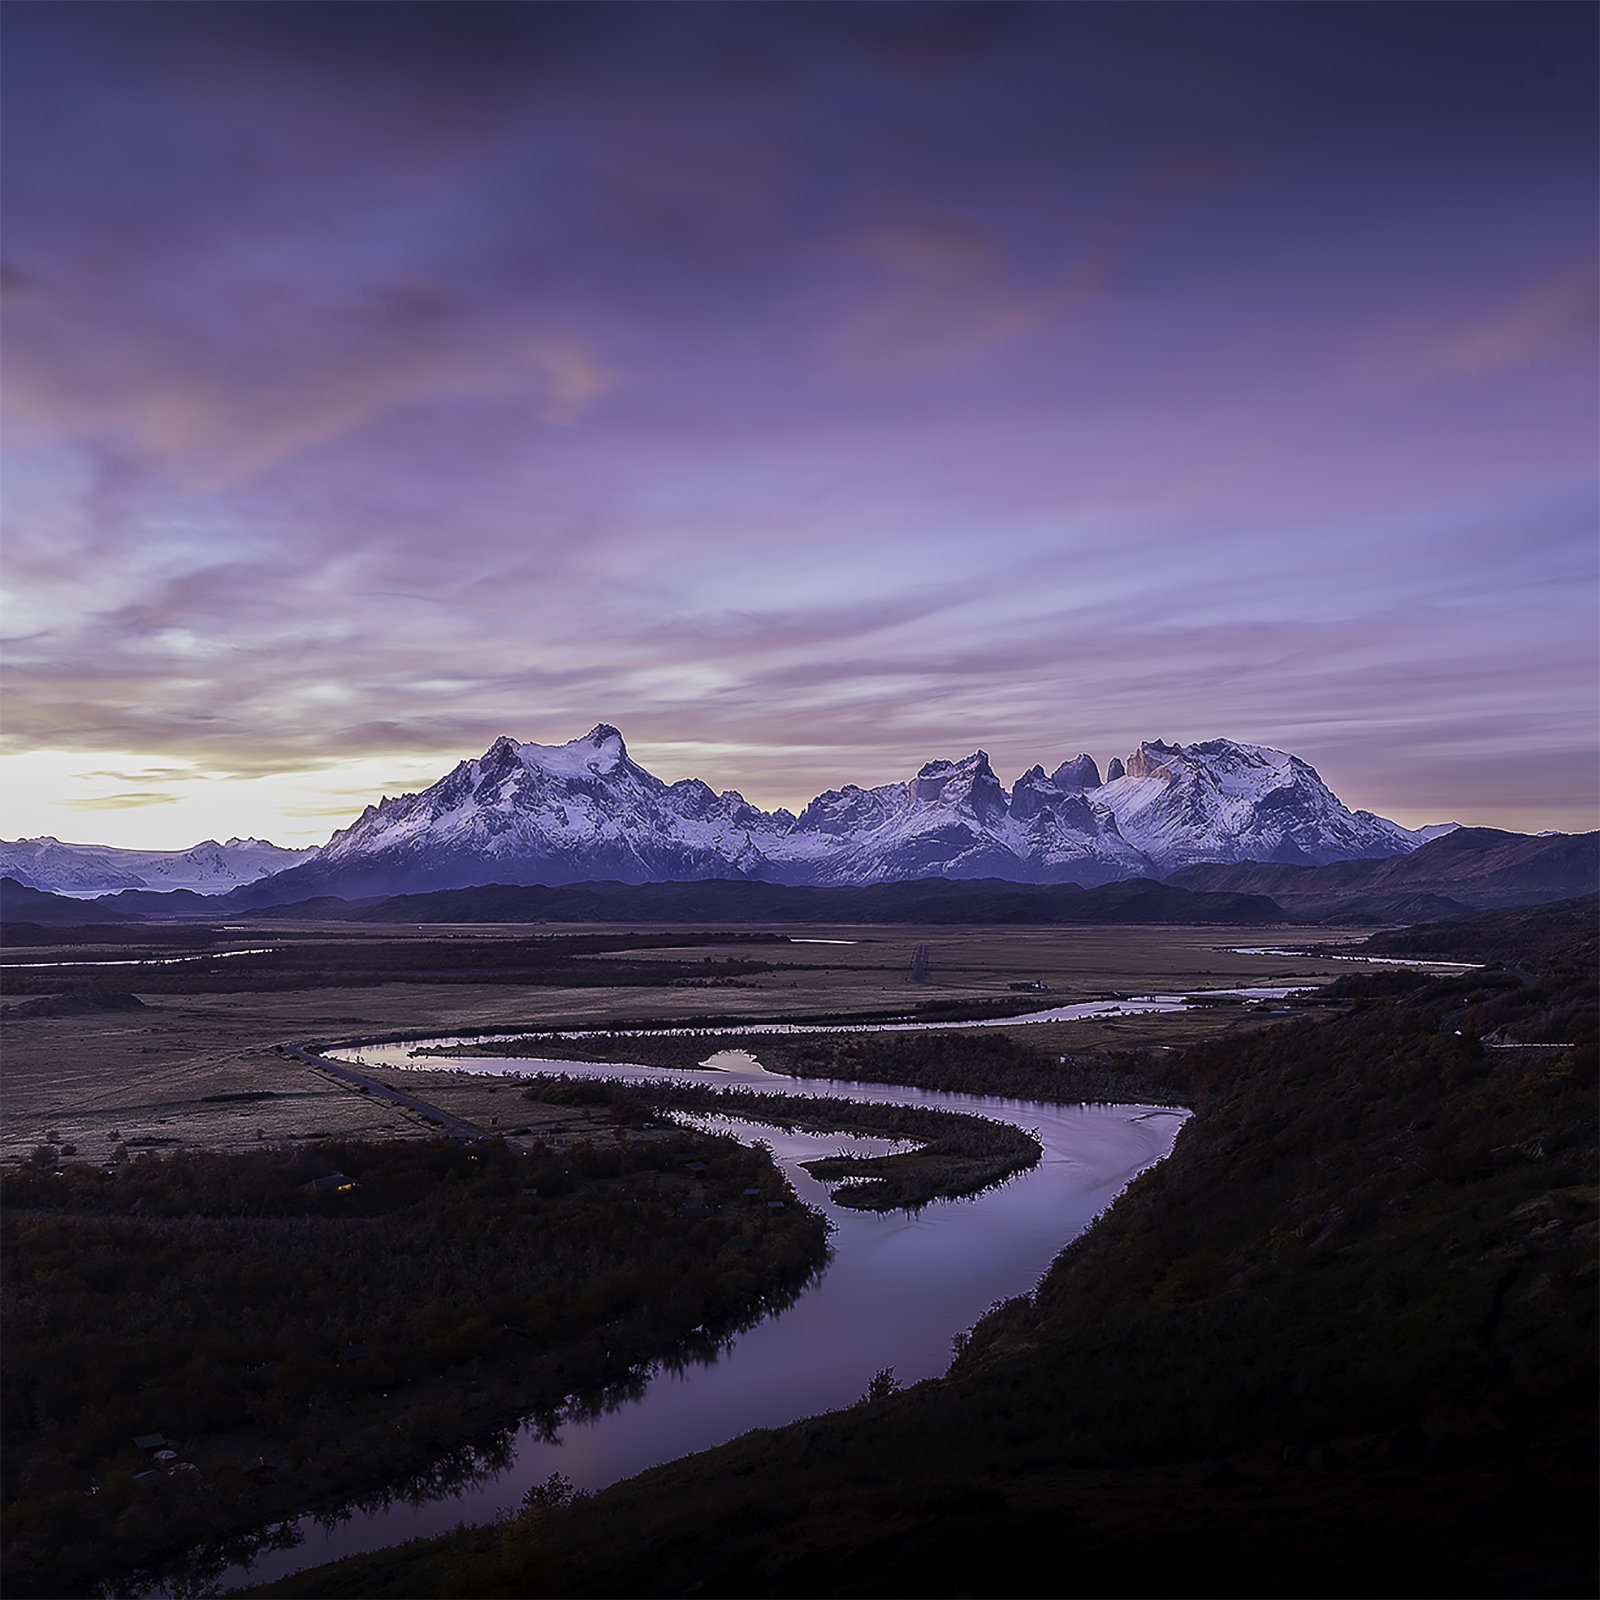 salisbury_robert_chile_patagonia_serreno_view.jpg